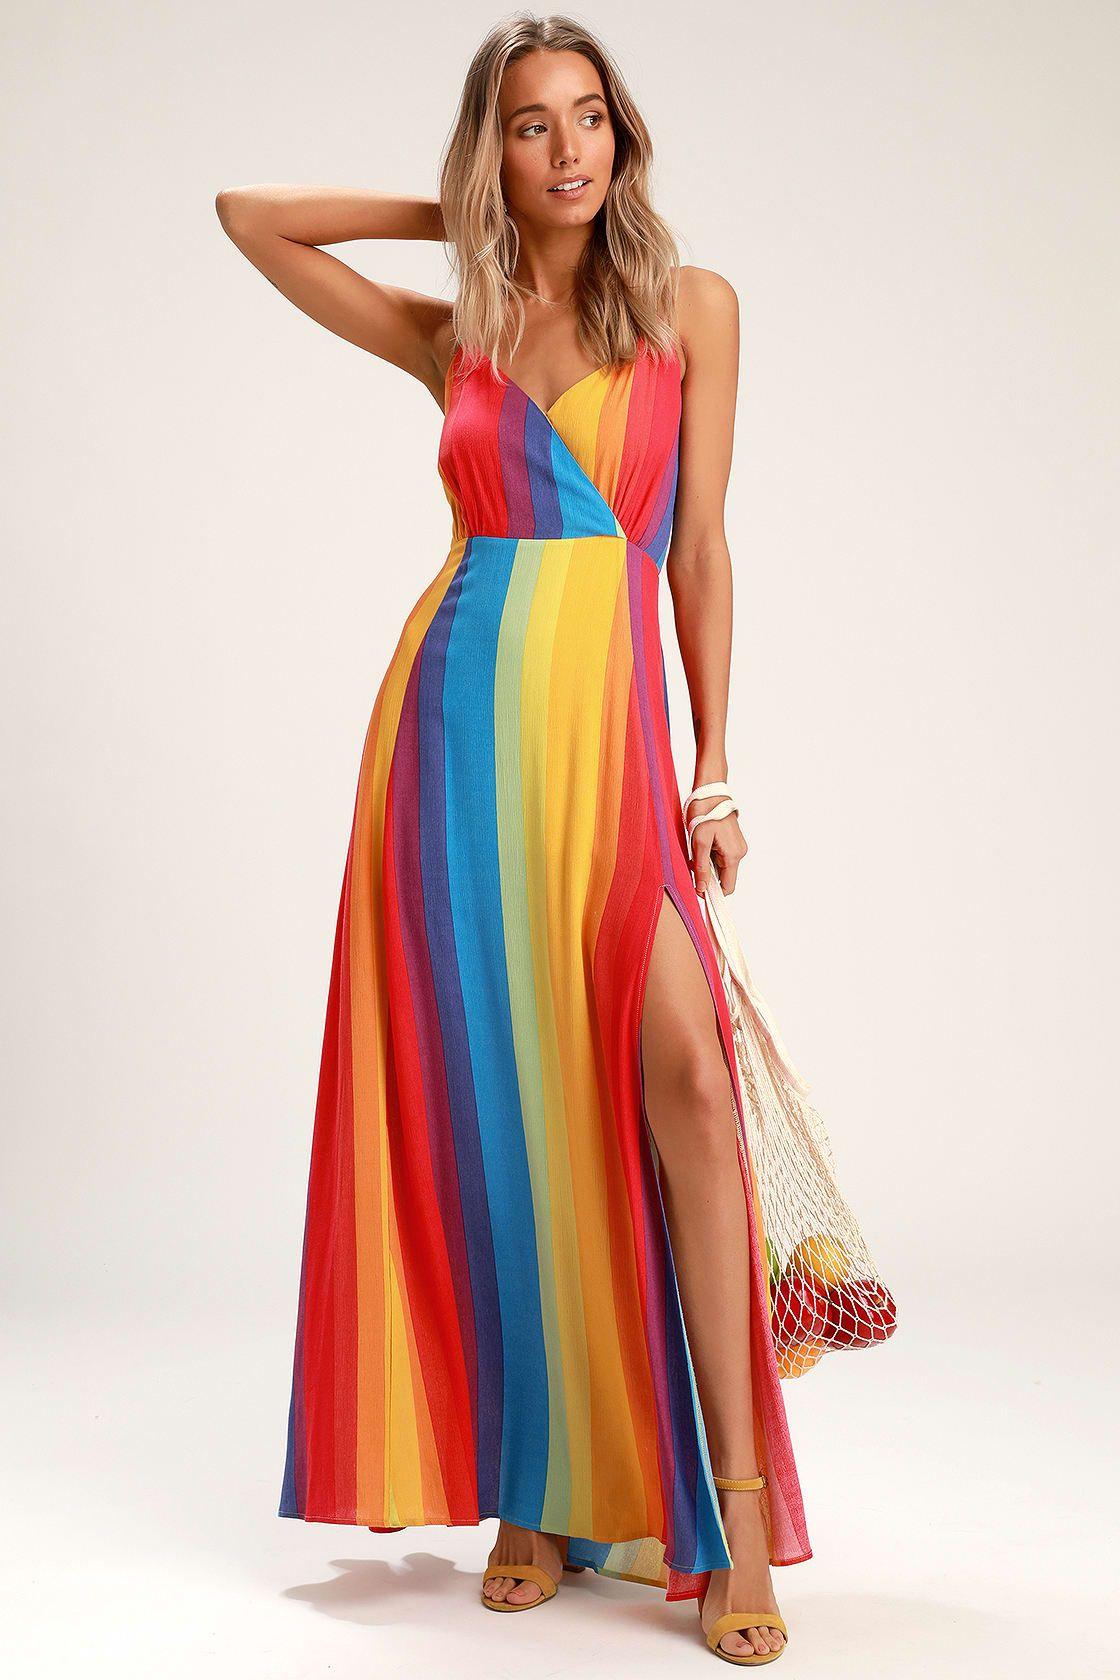 Lafern Rainbow Striped Sleeveless Maxi Dress Rainbow Dress Maxi Dress Dresses [ 1680 x 1120 Pixel ]